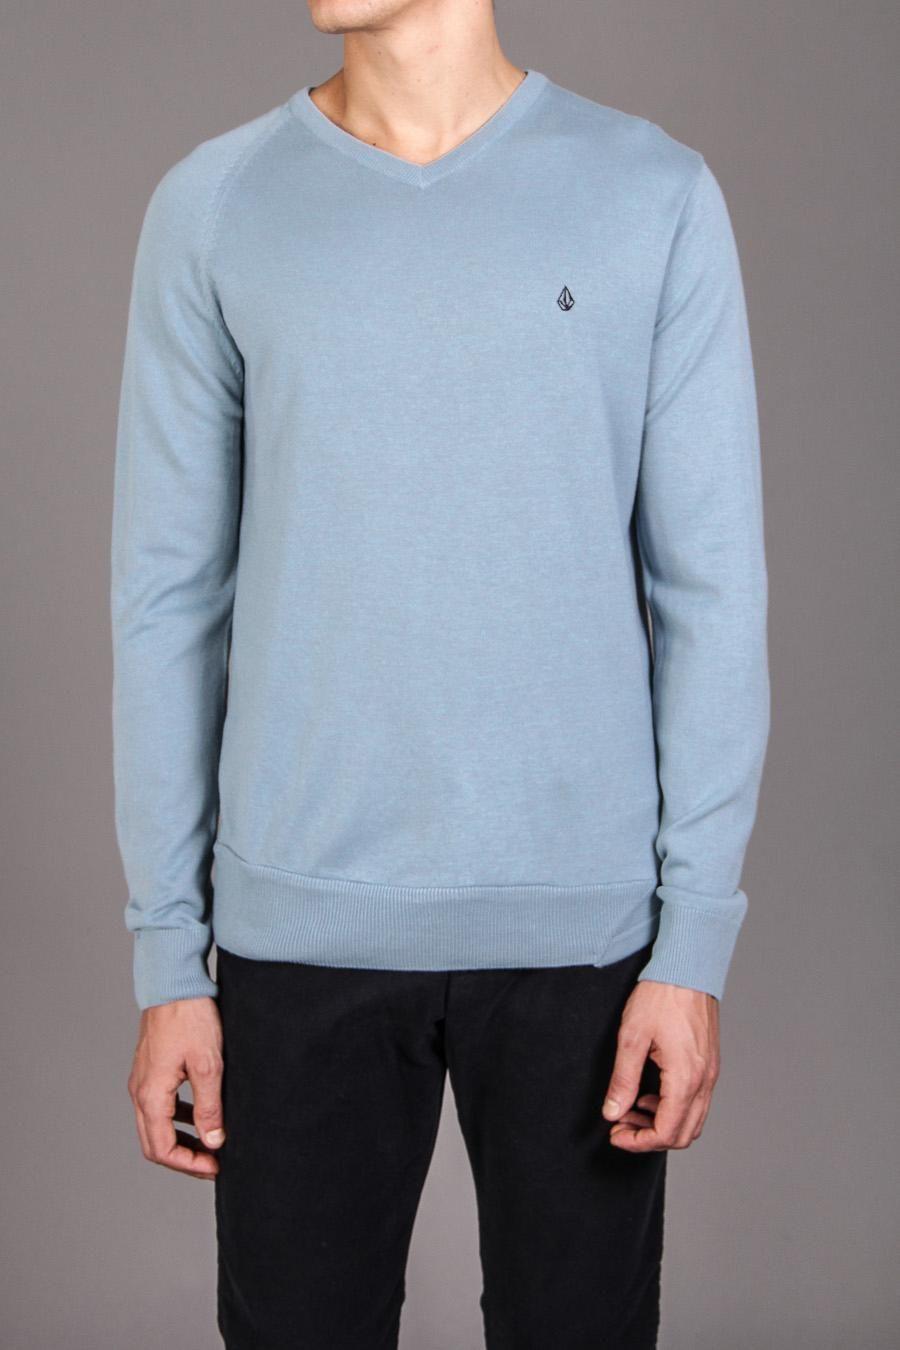 19 99 Volcom Standard Sweater Dark Blue Long Sleeve Tshirt Men Dapper Style Men Casual